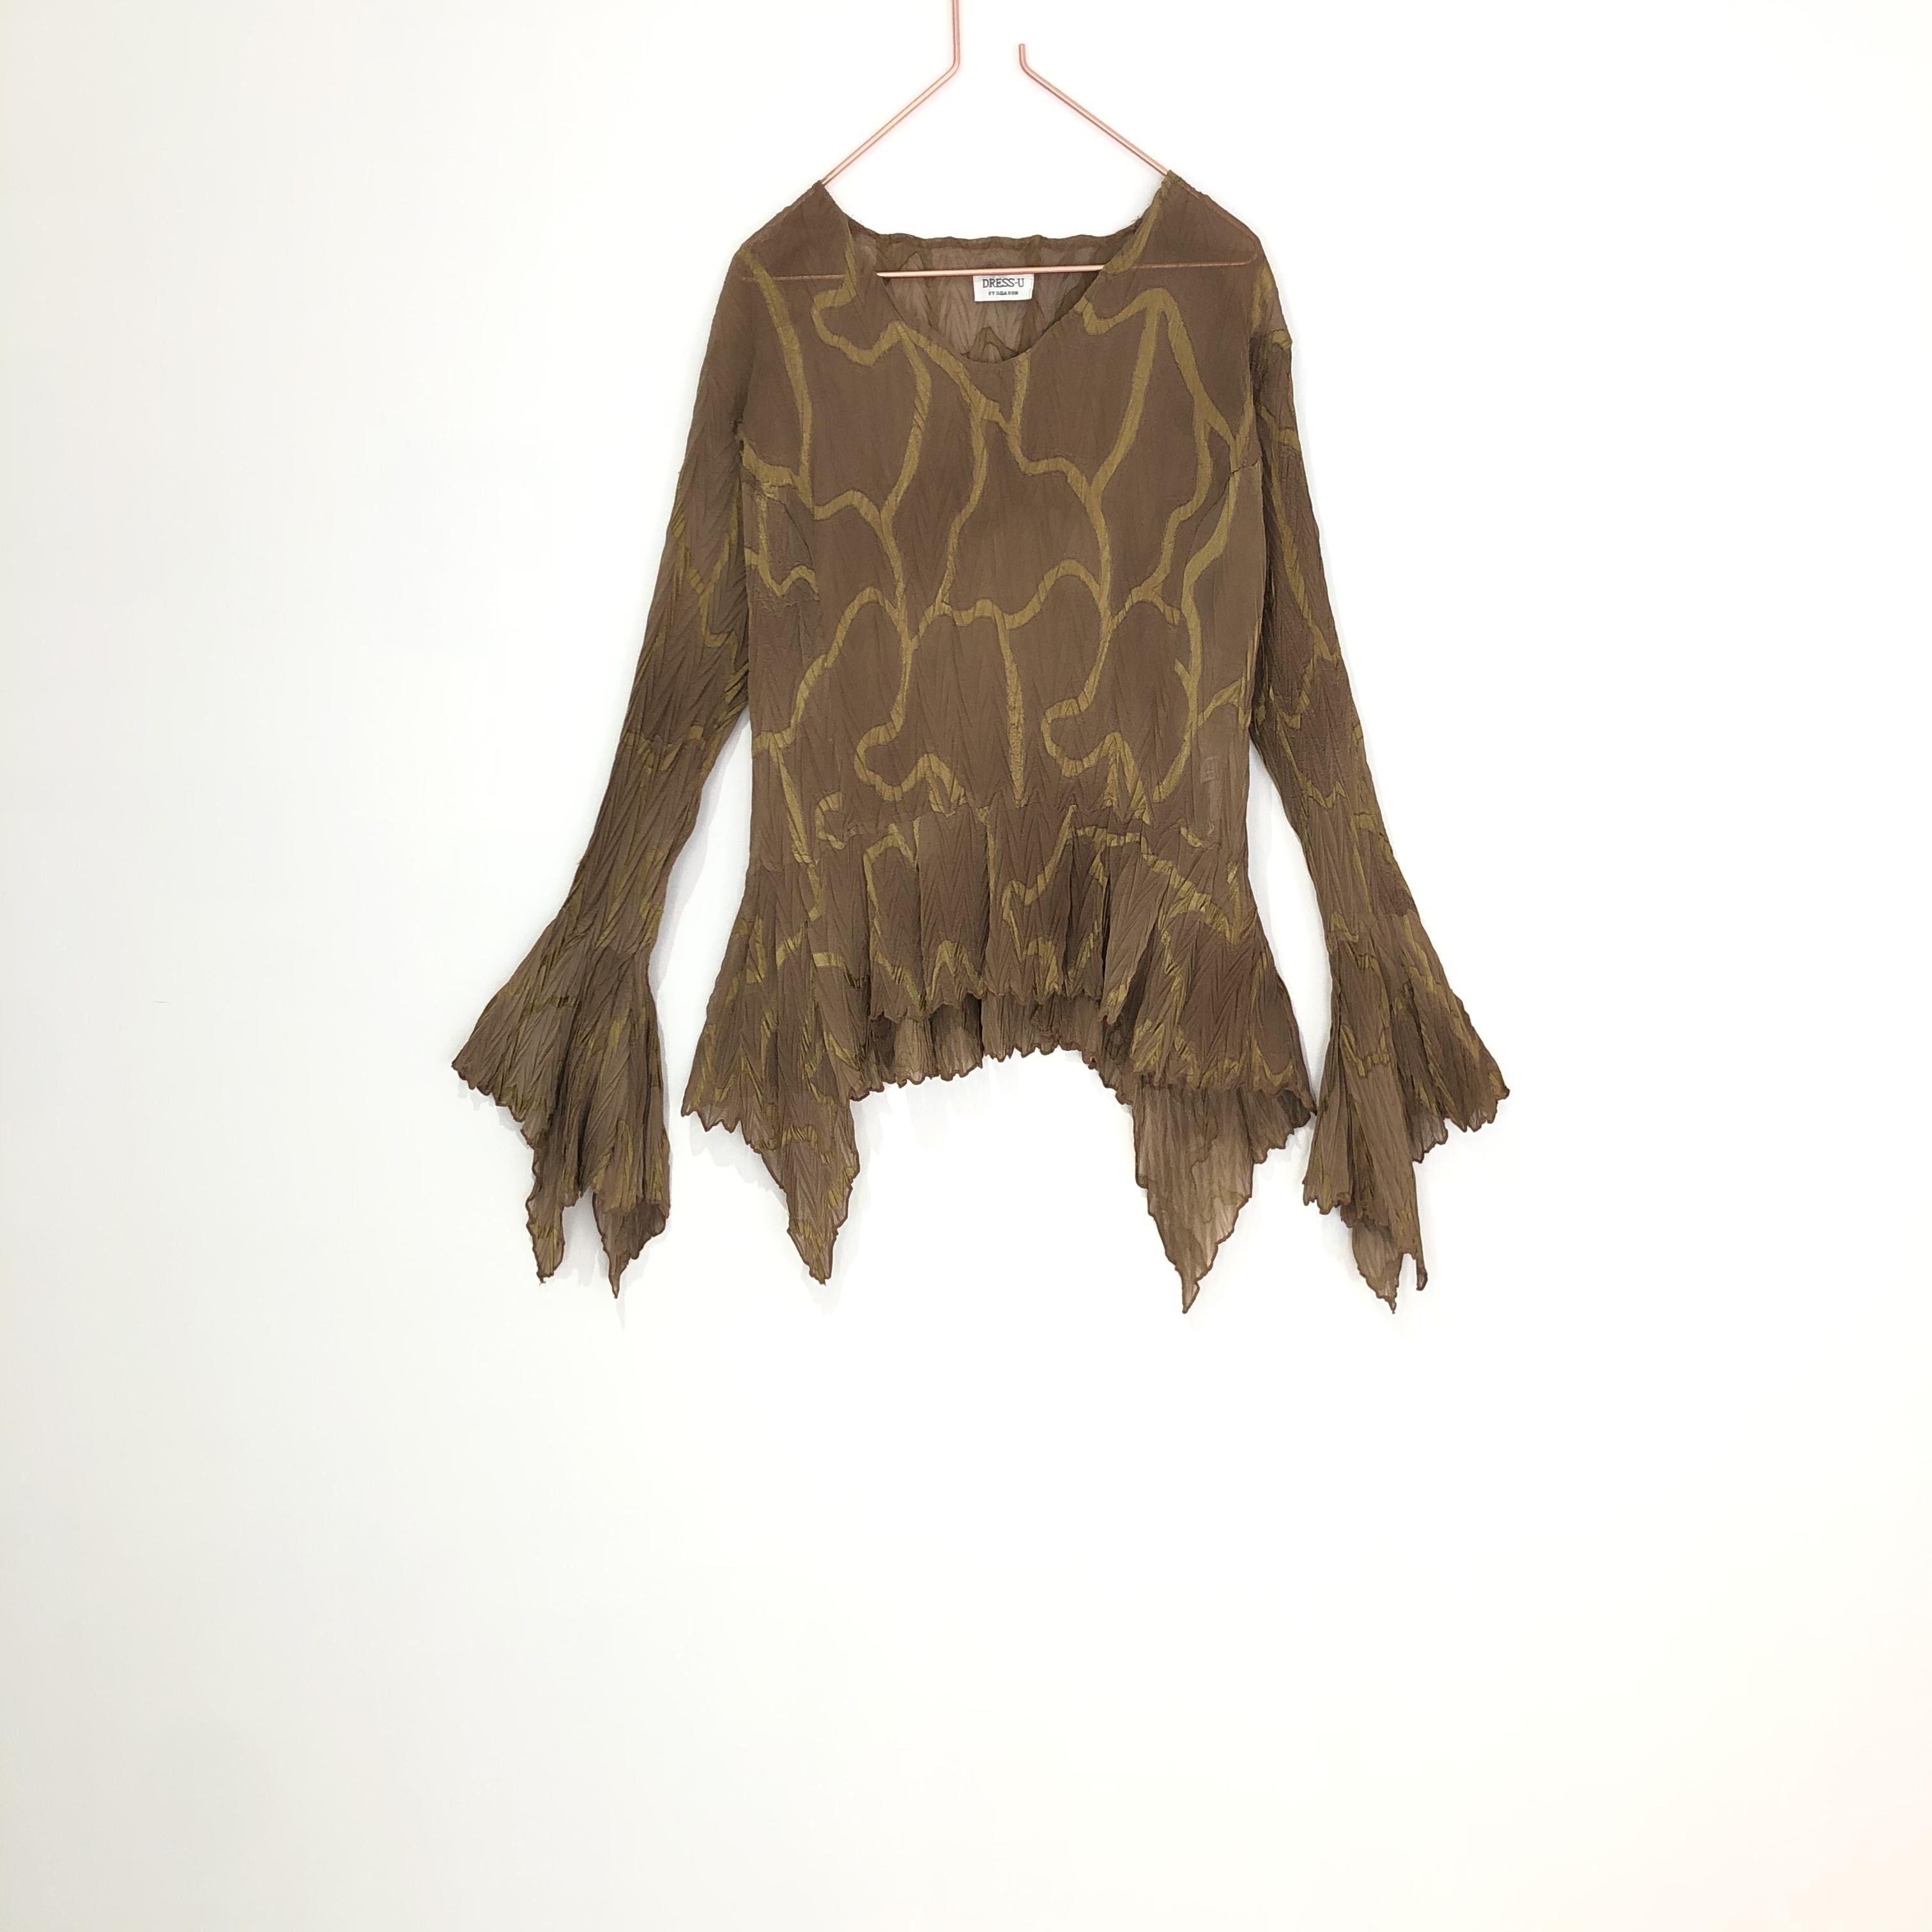 ◼︎90s asymmetric hem blouse from U.S.A.◼︎